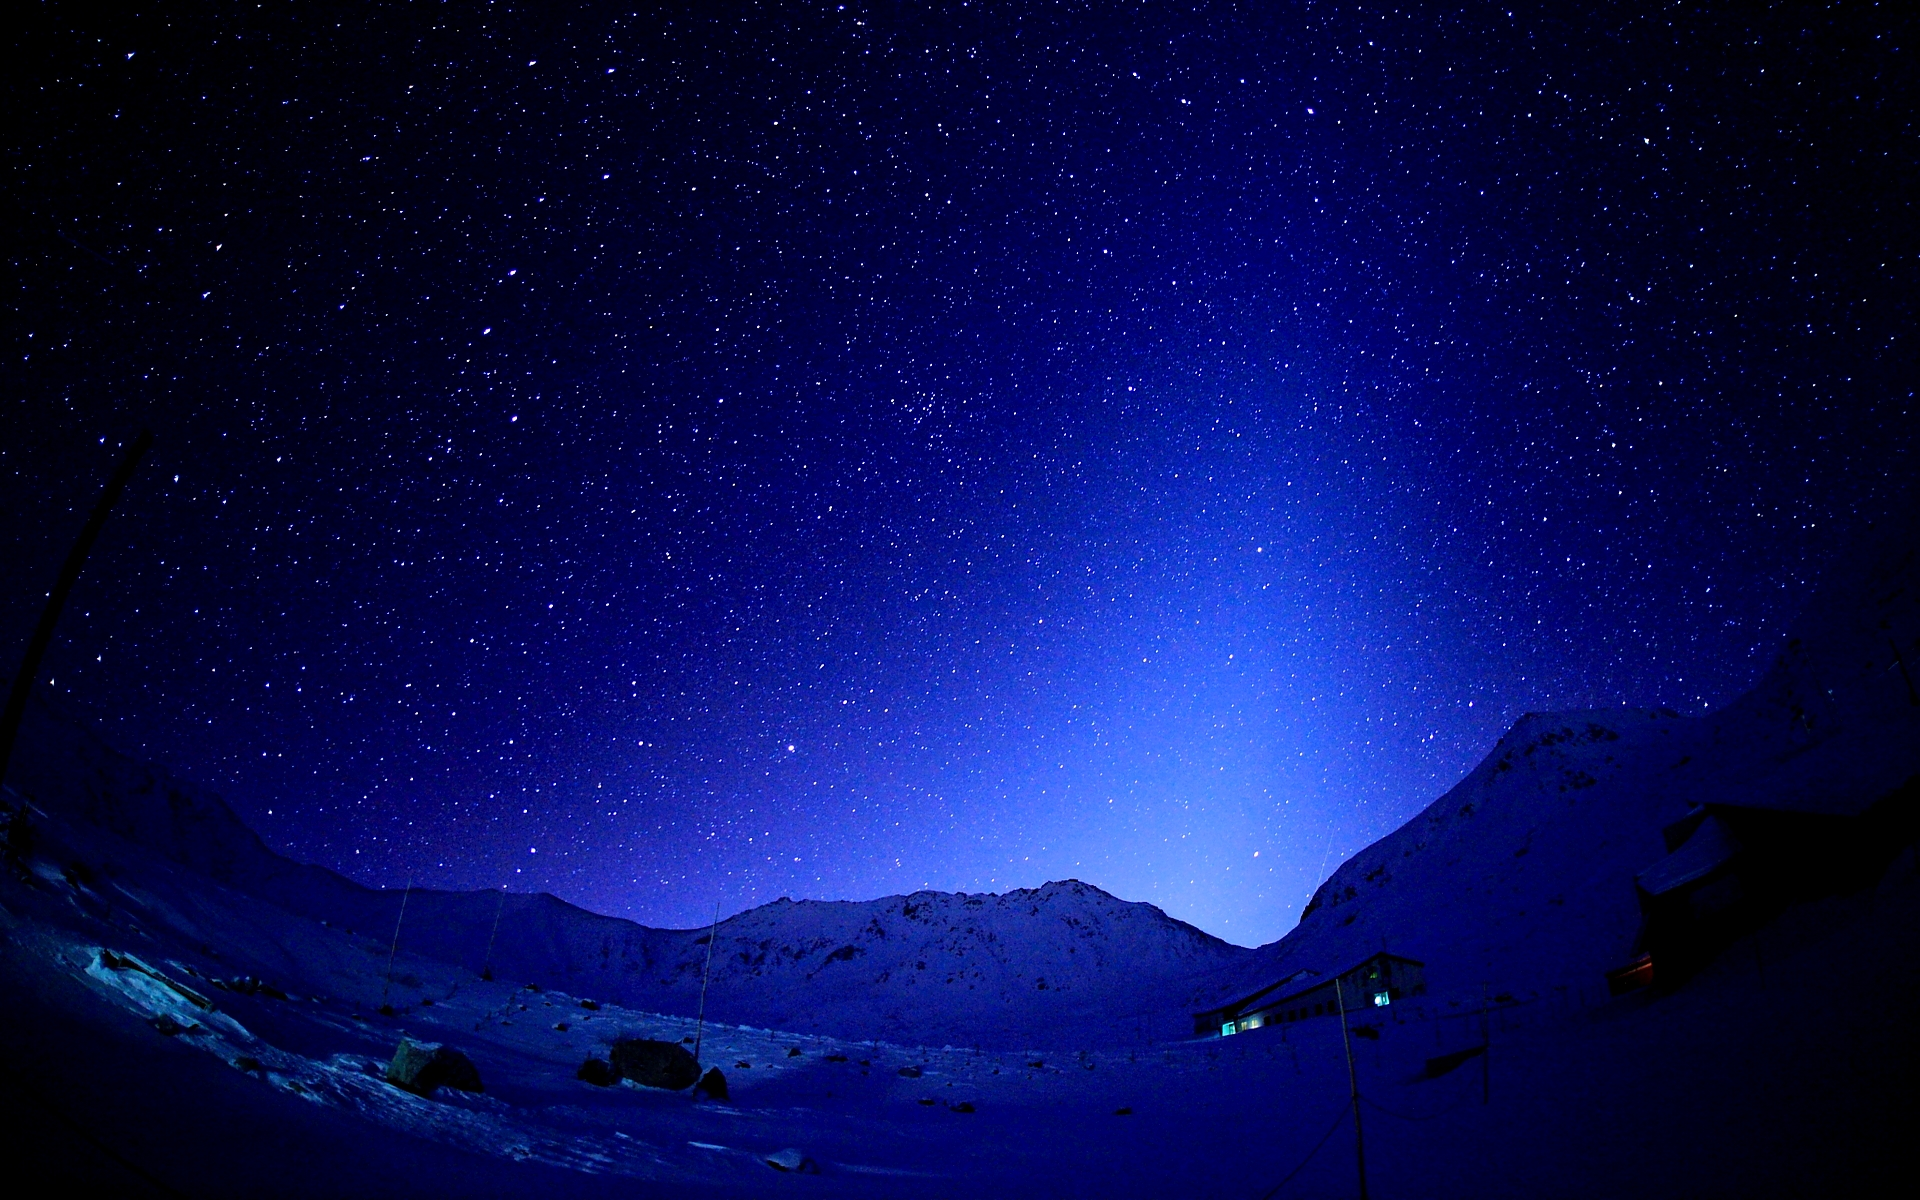 Starry Sky Wallpaper  HD Desktop Wallpapers 4k